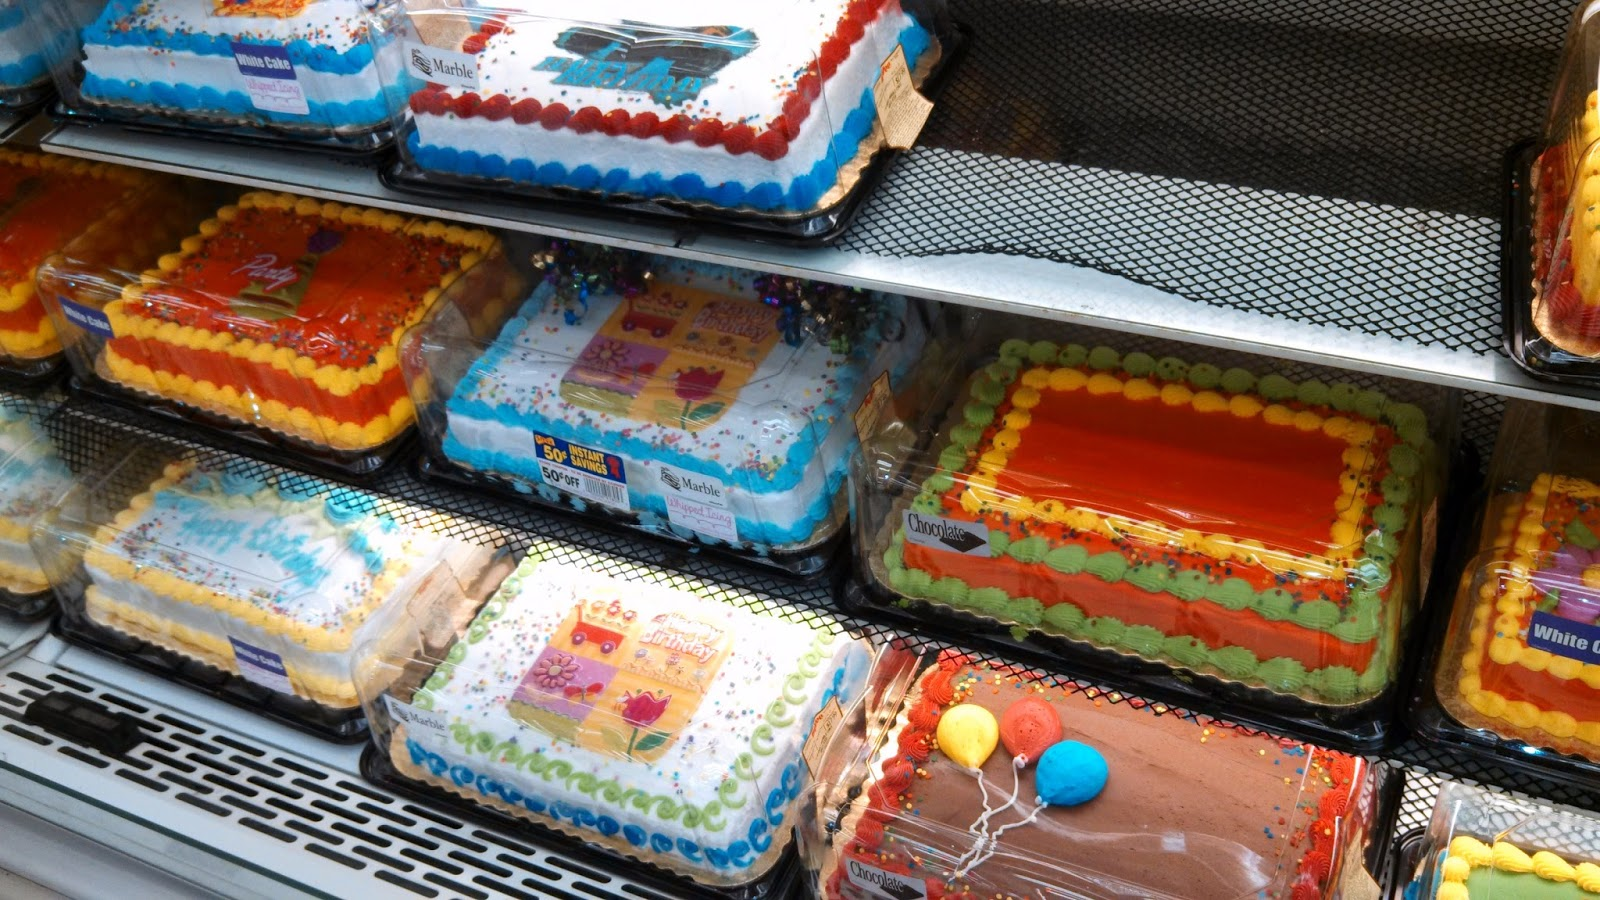 Costco Cakes In Store